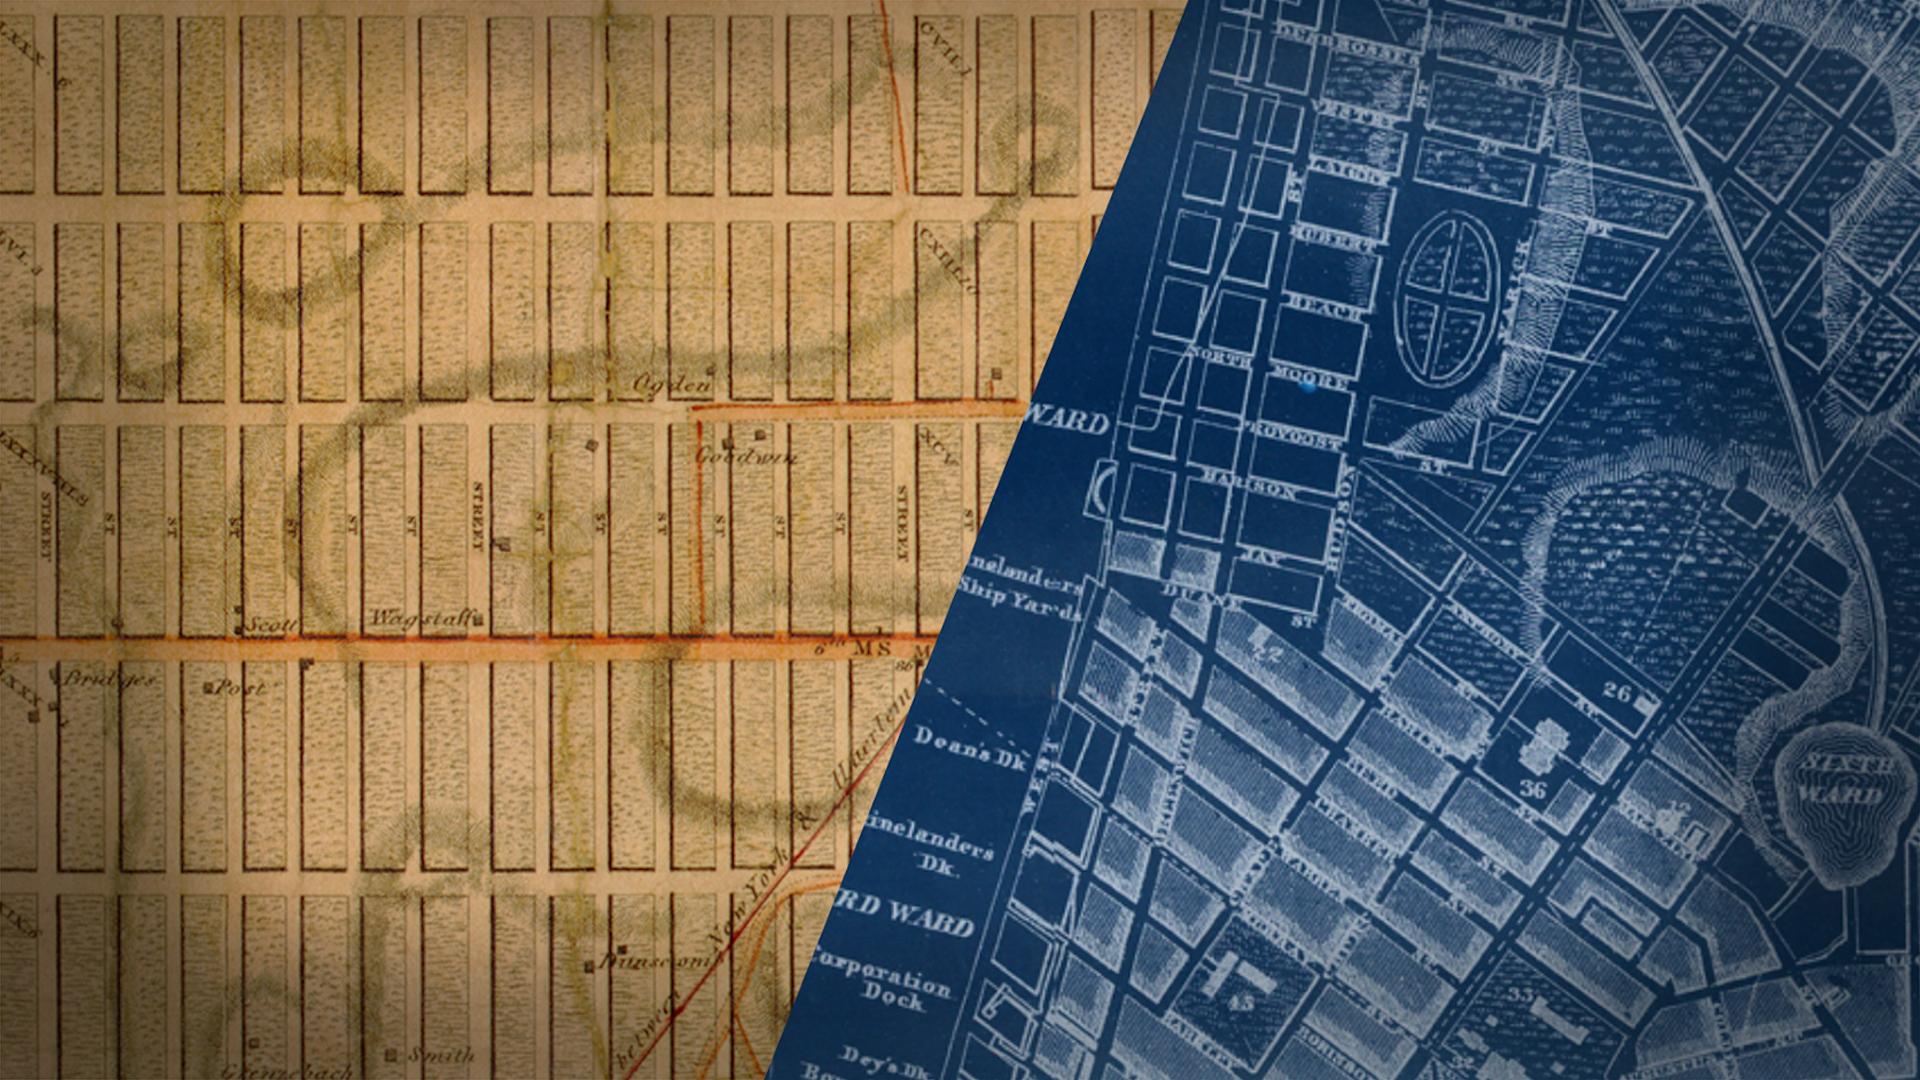 Manhattan city plans